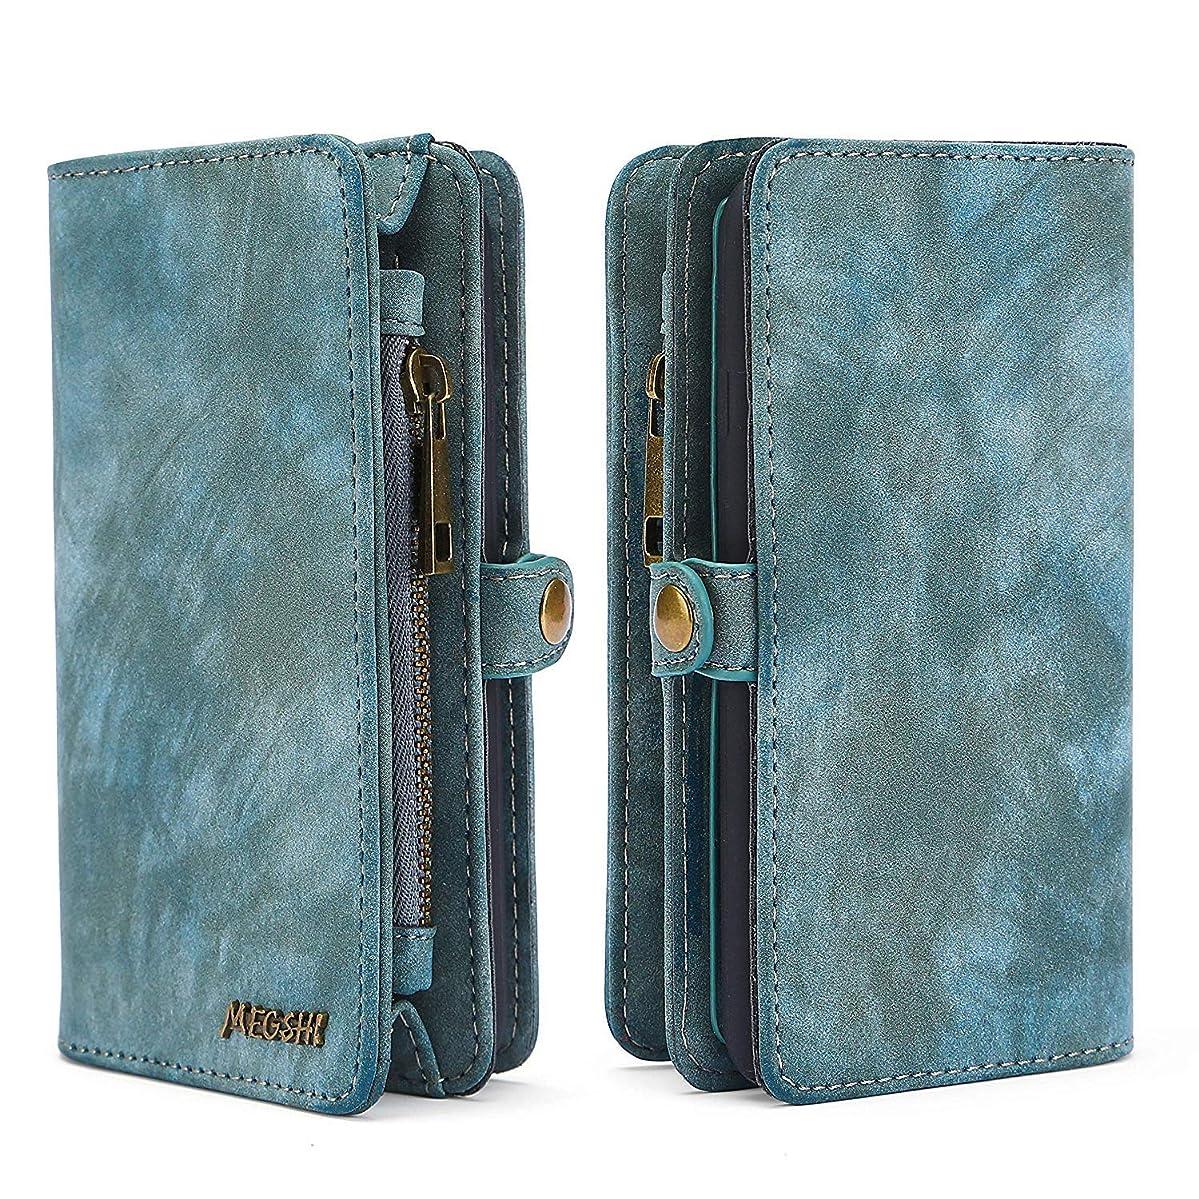 Spritech LG Stylo 3 Case,LG Stylo 3 Wallet Case,Handmade Leather Large Capacity Detachable Zipper Wallet Cover